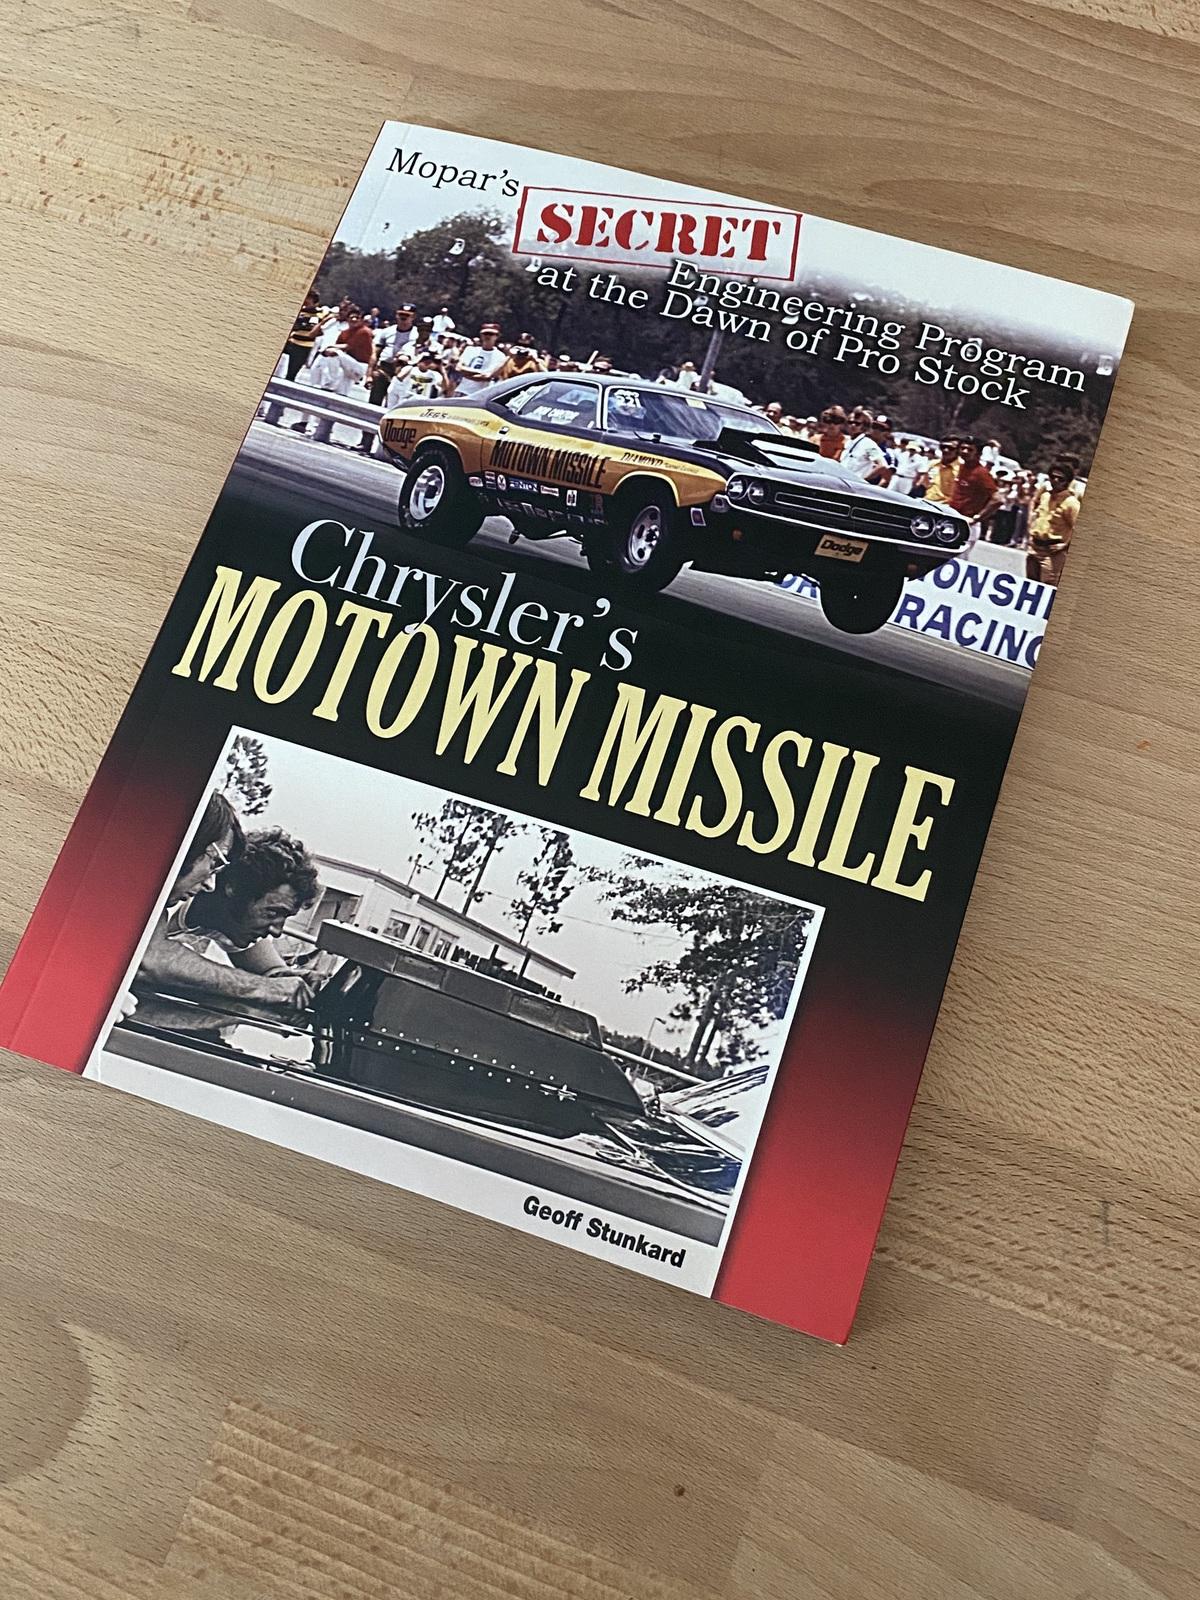 BangShift Book Corner: Chrysler's Motown Missile -Mopar's Secret Engineering Program At The Dawn of Pro Stock By Geoff Stunkard